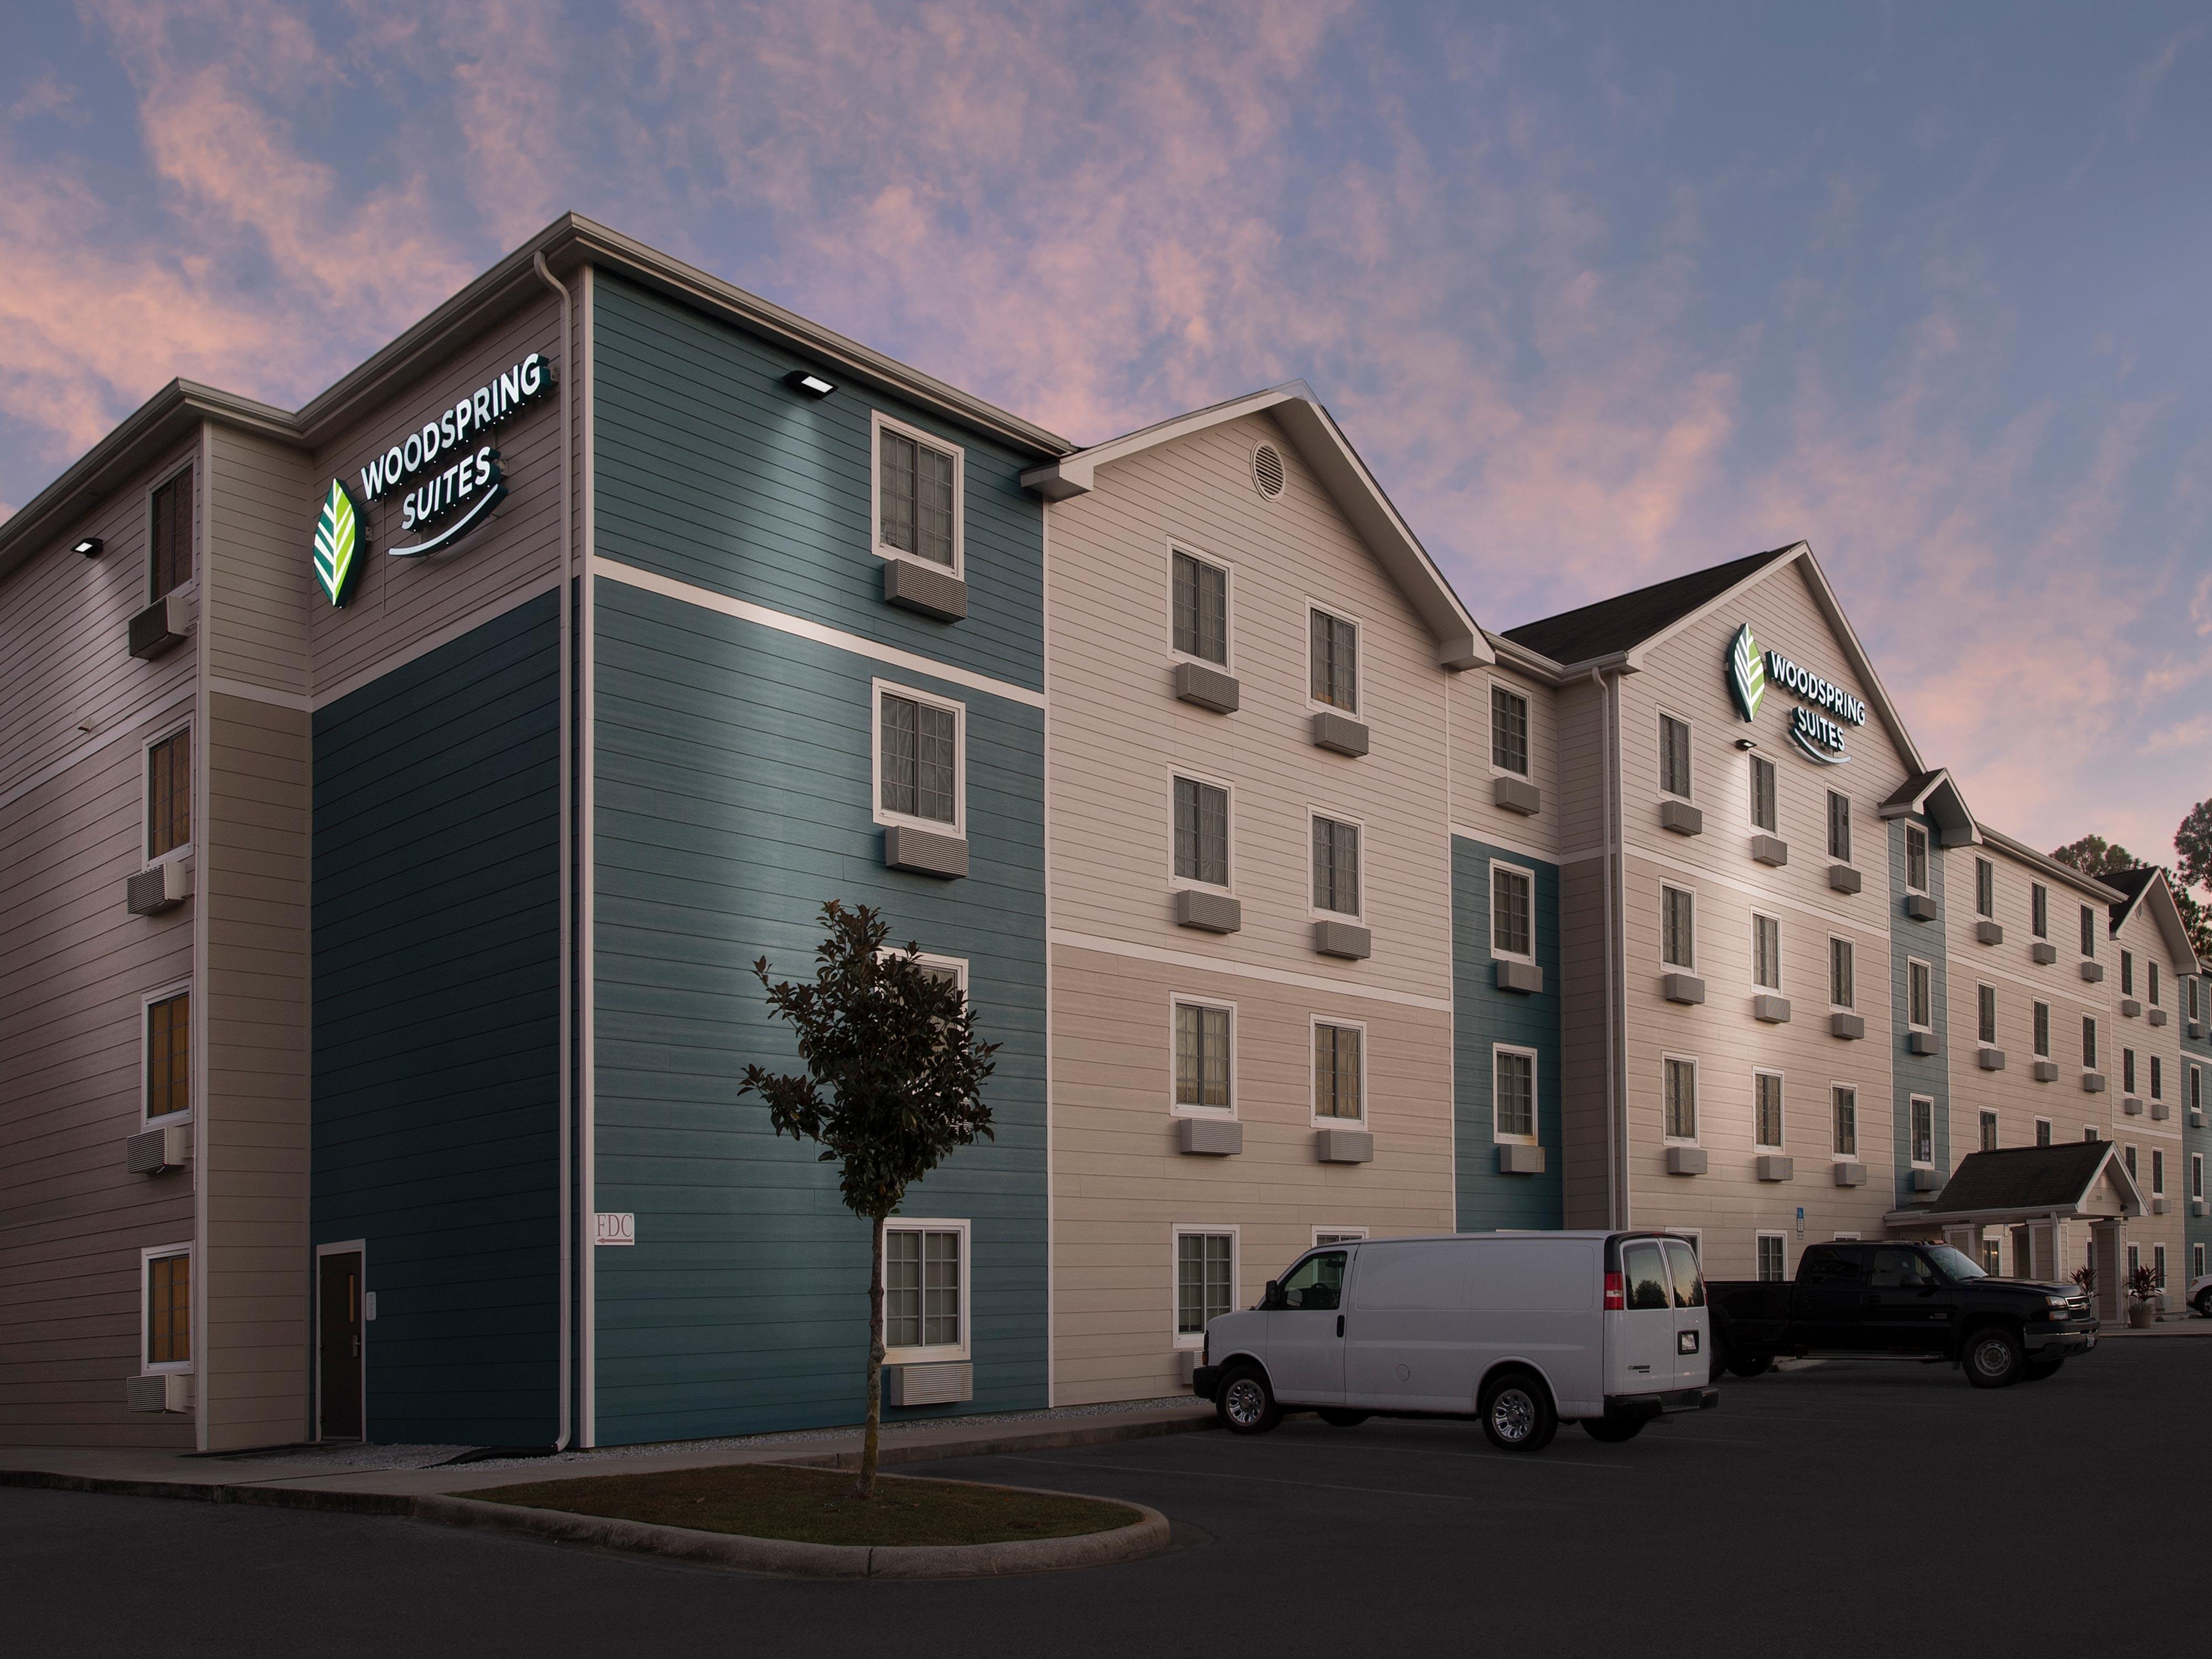 WoodSpring Suites Pensacola Northeast image 7